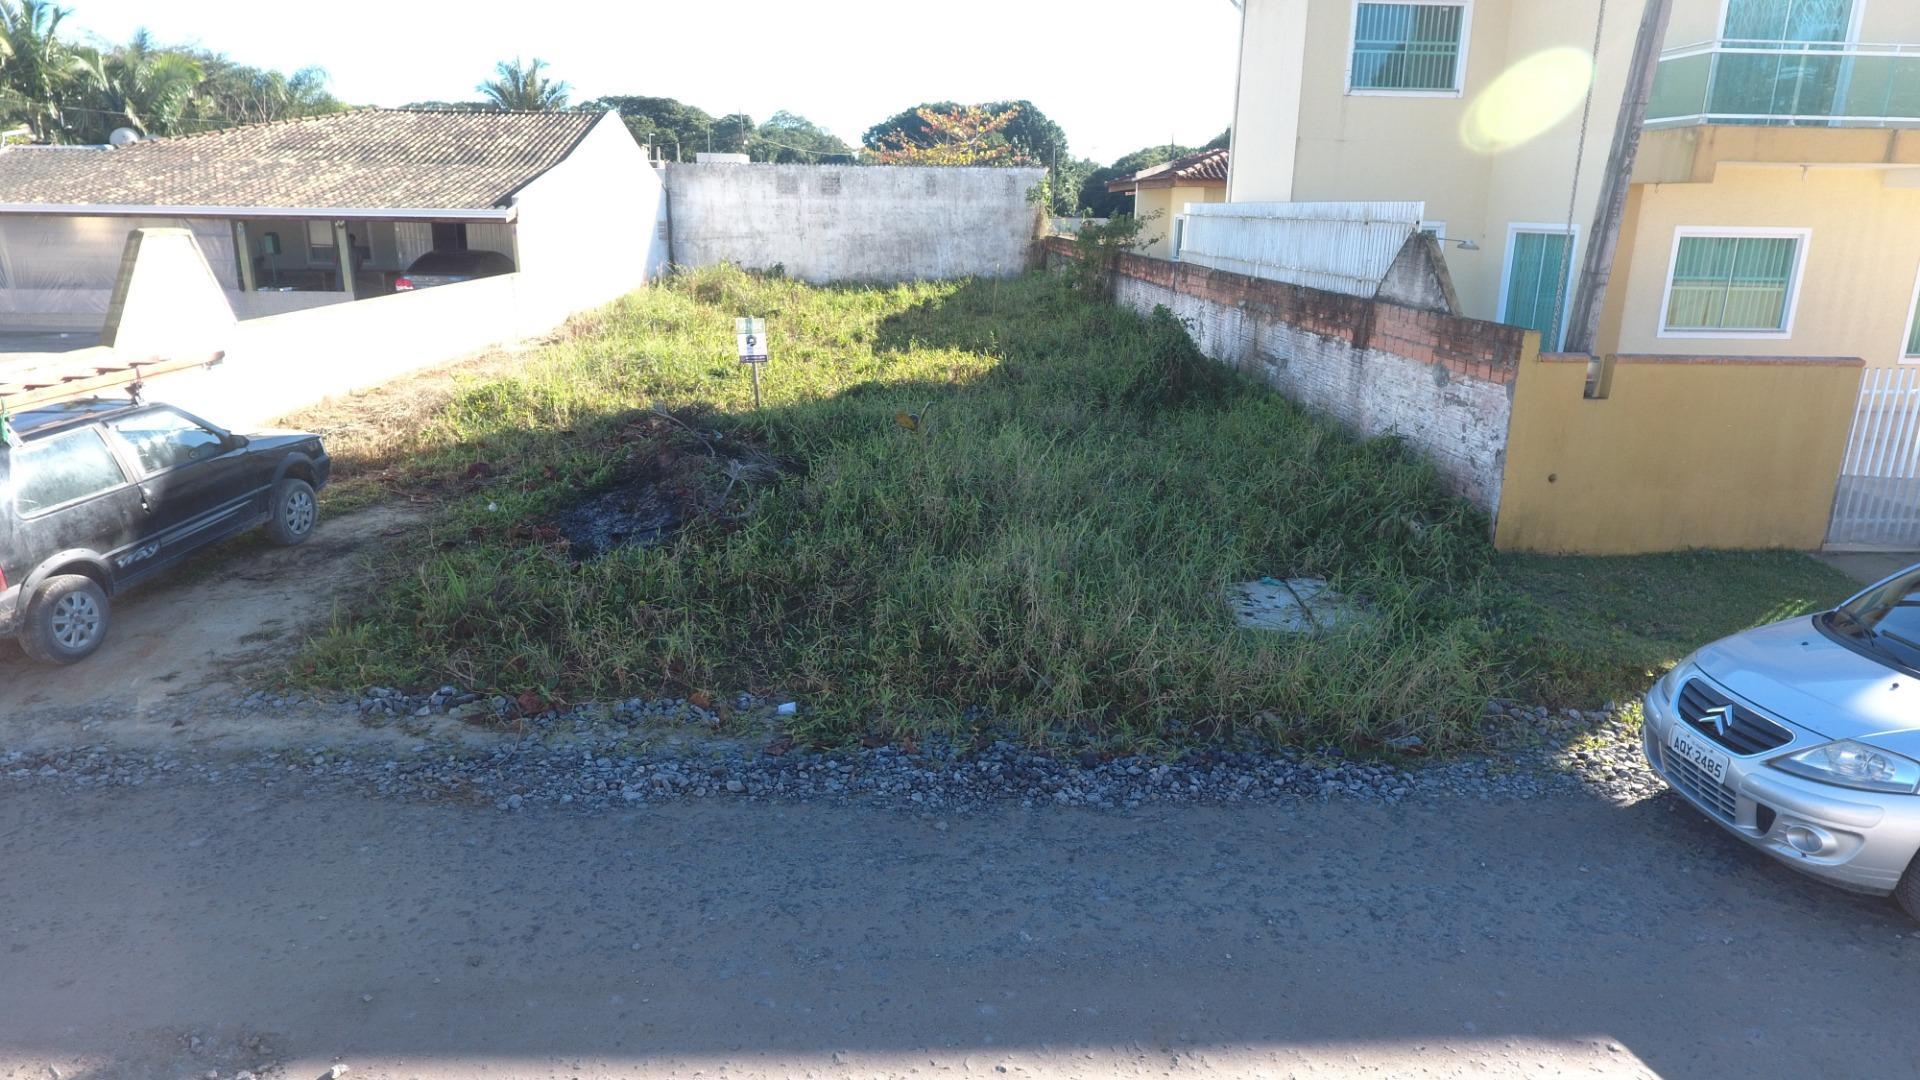 Terreno à venda, 379 m² por R$ 250.000 - Jardim da Barra - Itapoá/SC